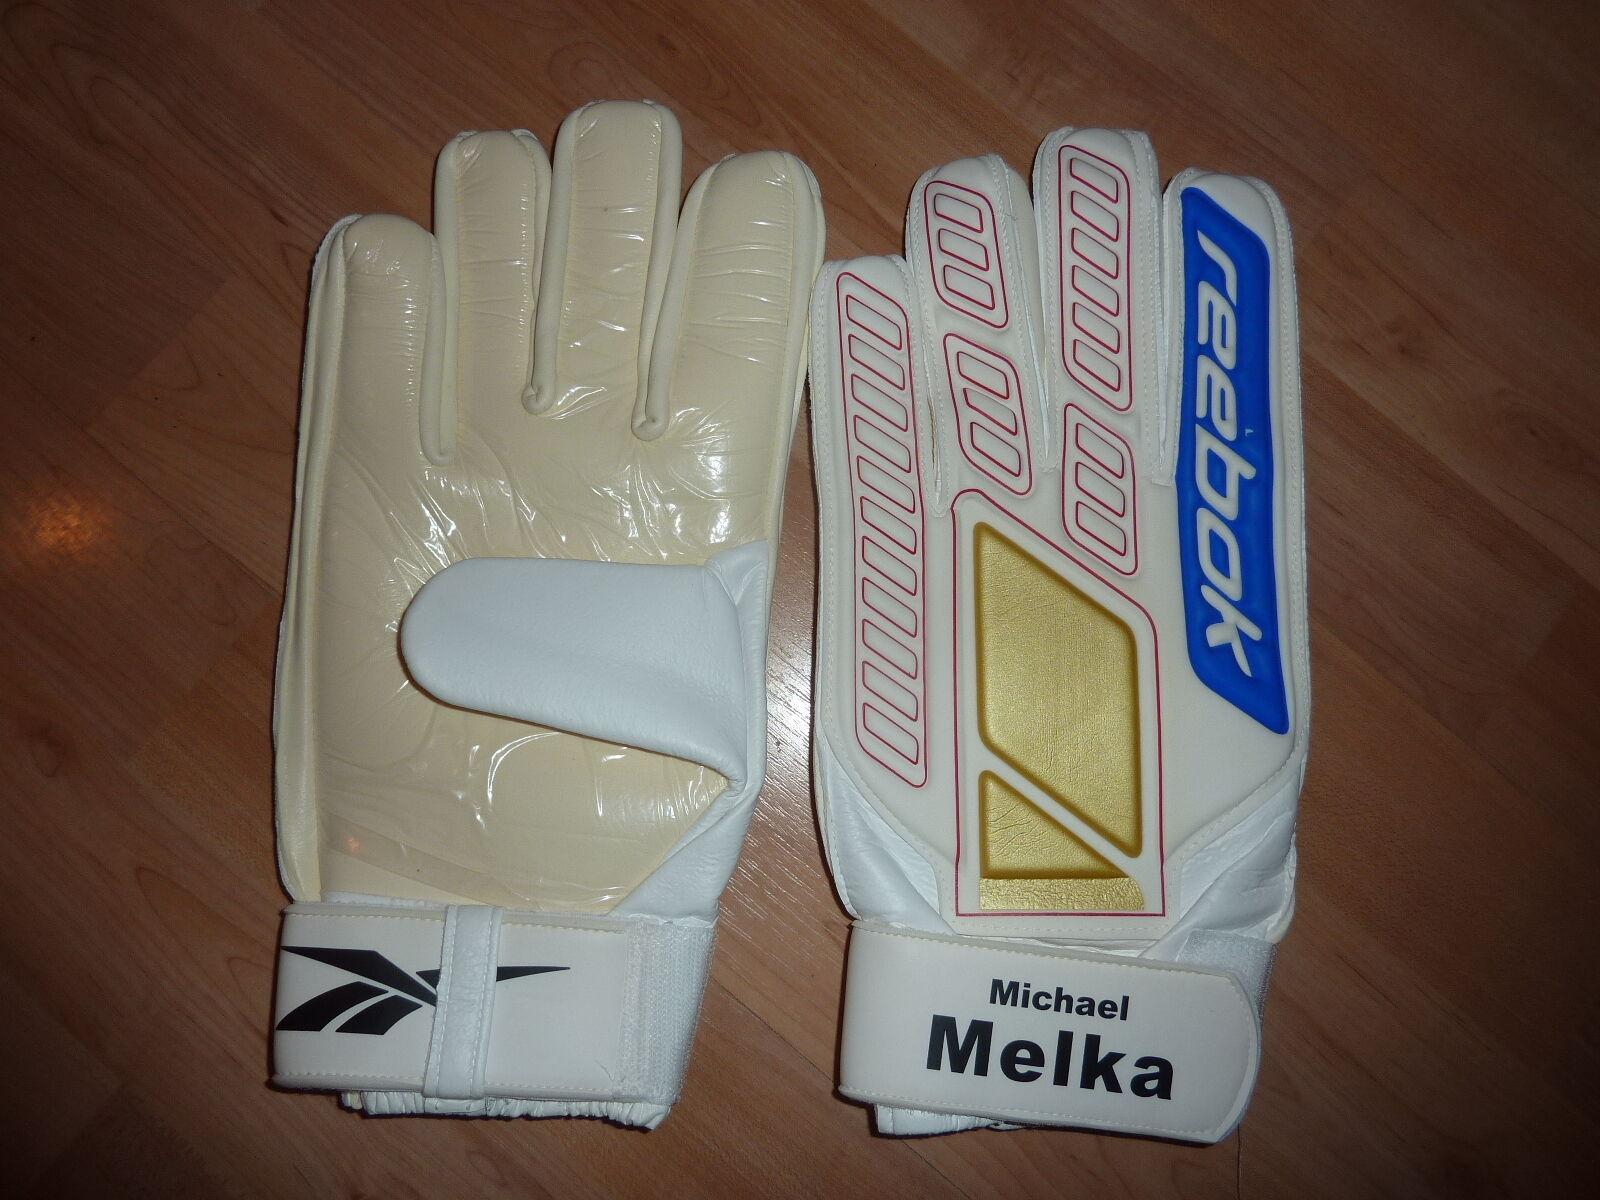 Michael Melka Fortuna Düsseldorf Torwart Handschuhe reebok (no (no (no Trikot)  neu OVP 366300